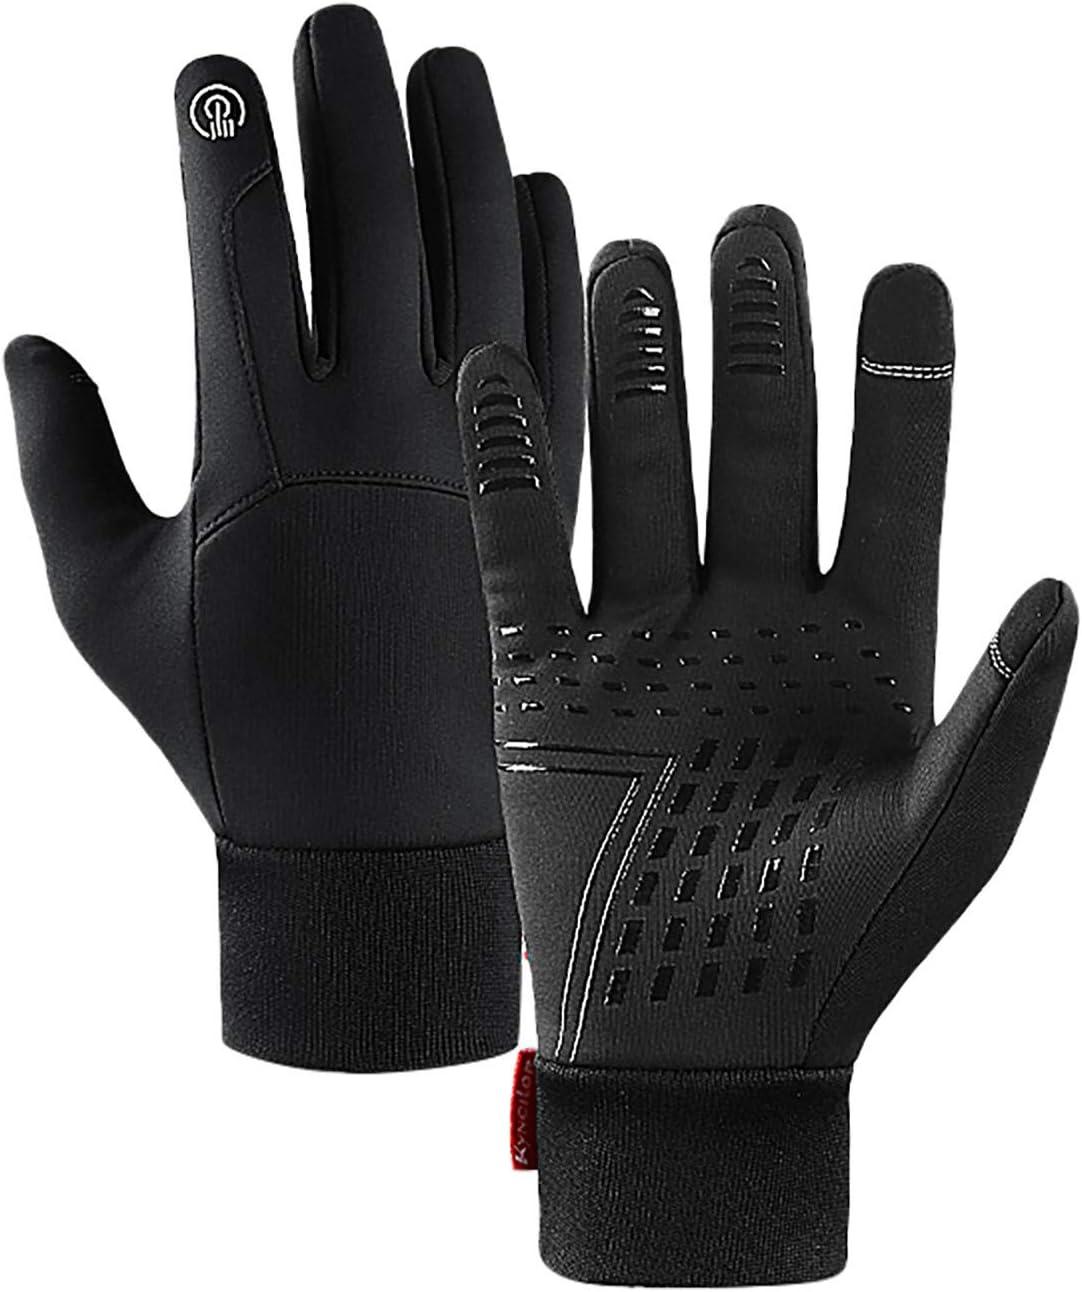 Goutique Winter Ski Gloves for Men Women,Touchscreen Waterproof Keep Warm Waterproof Gloves for Cold Weather Outside,Lightweight Winter Gloves, Warm Water Resistant Touch Screen Gloves for Cycling